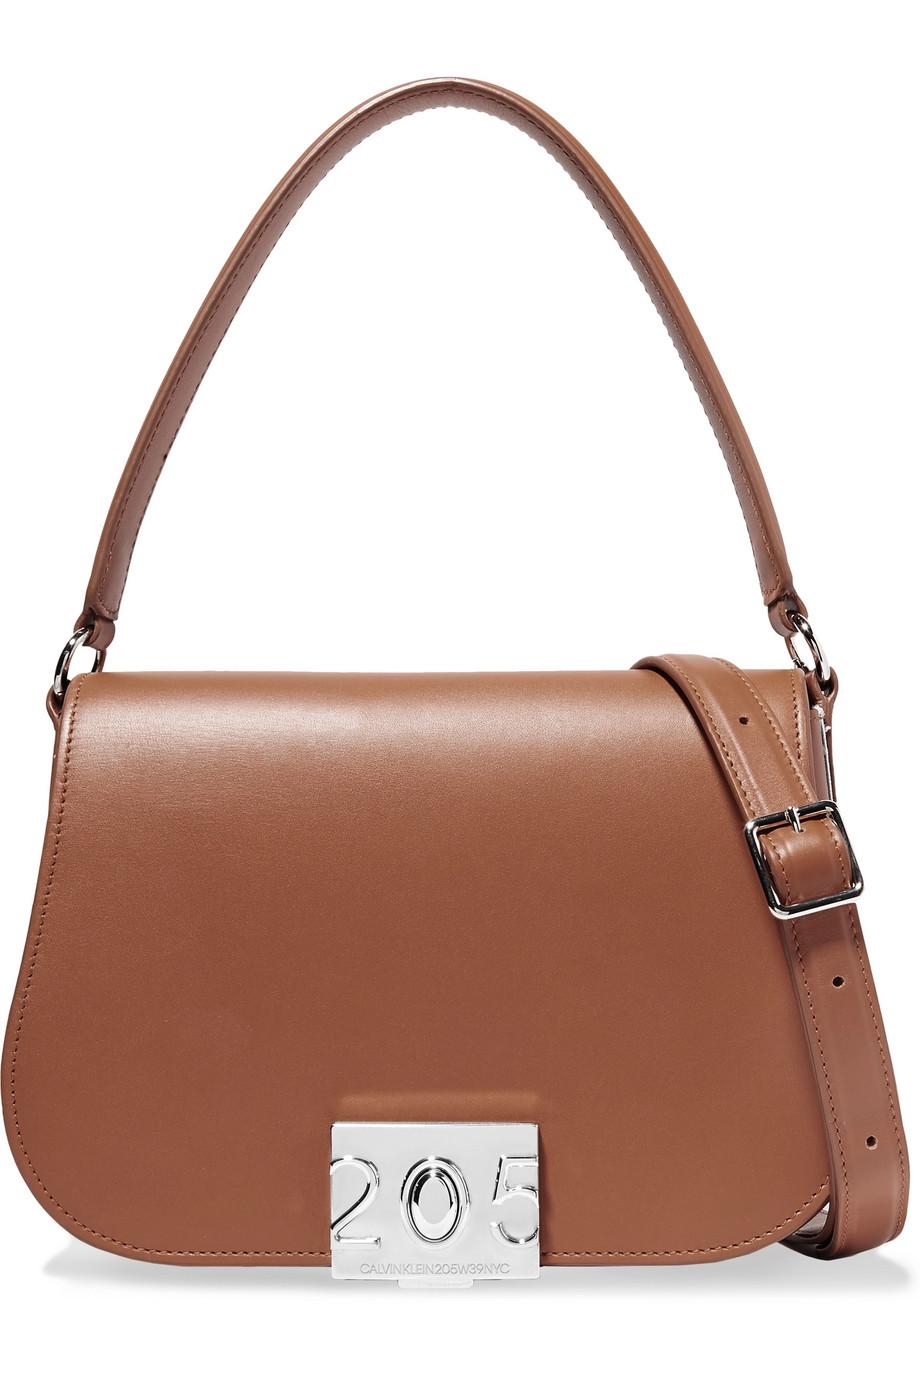 CALVIN KLEIN 205W39NYC Bonnie grosgrain-trimmed leather shoulder bag